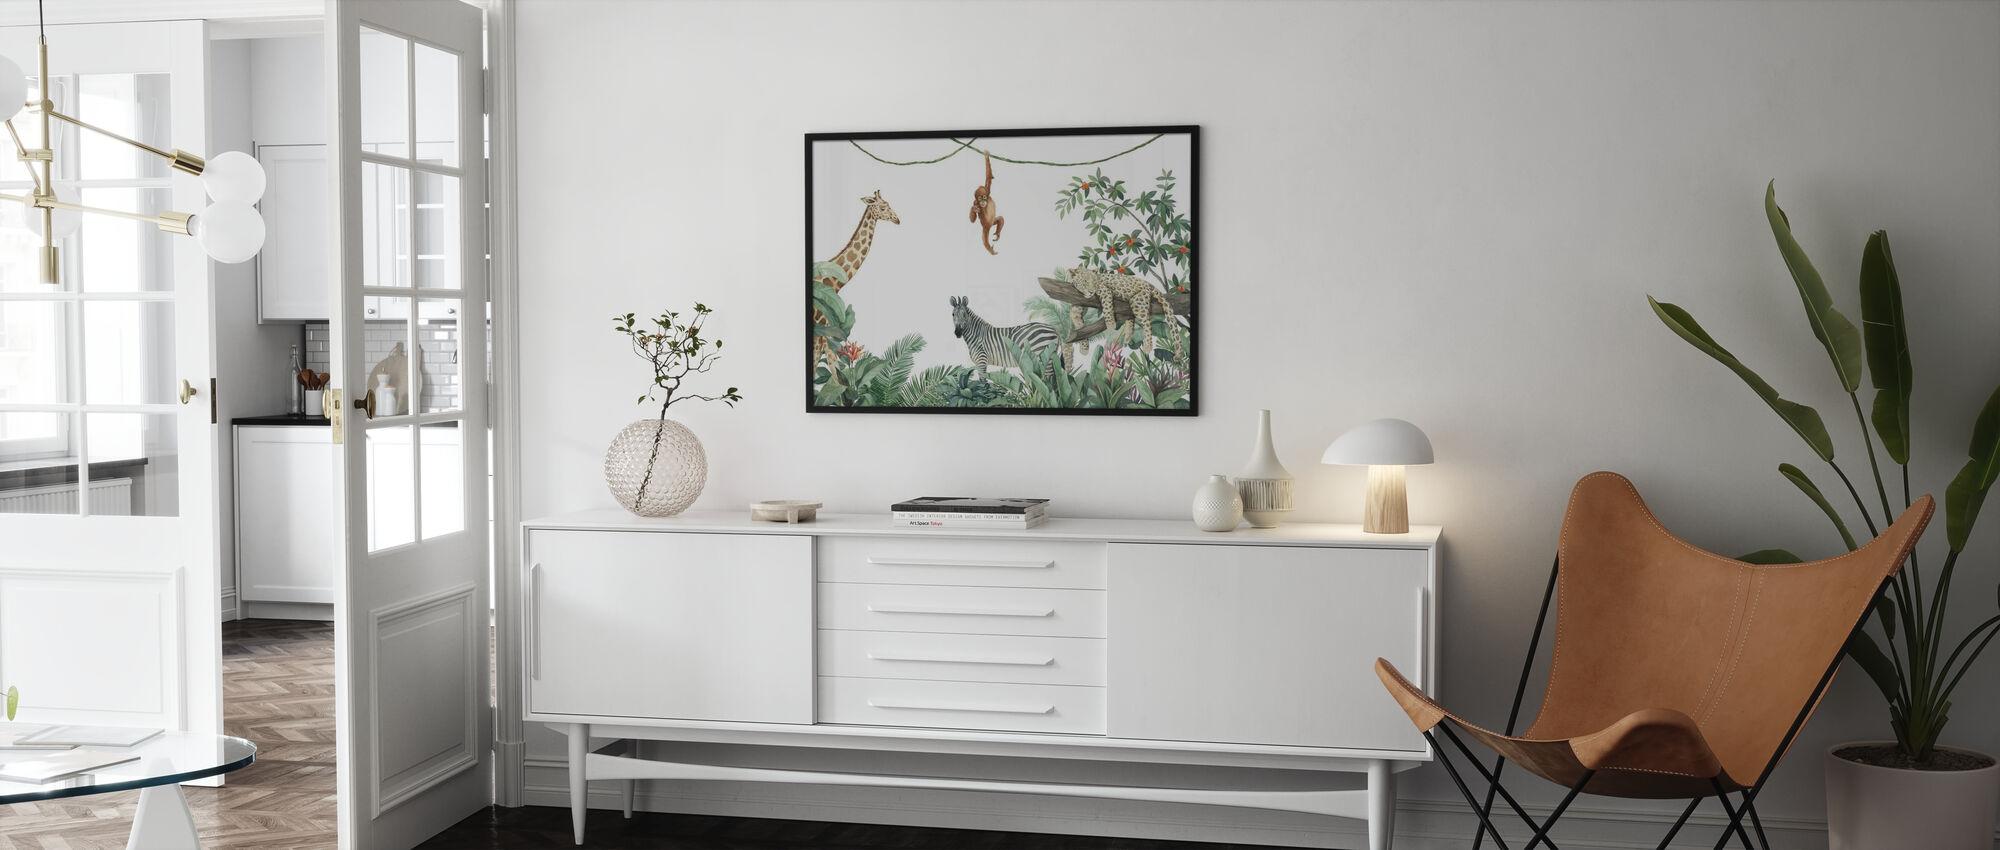 Jungle Friends - Poster - Living Room